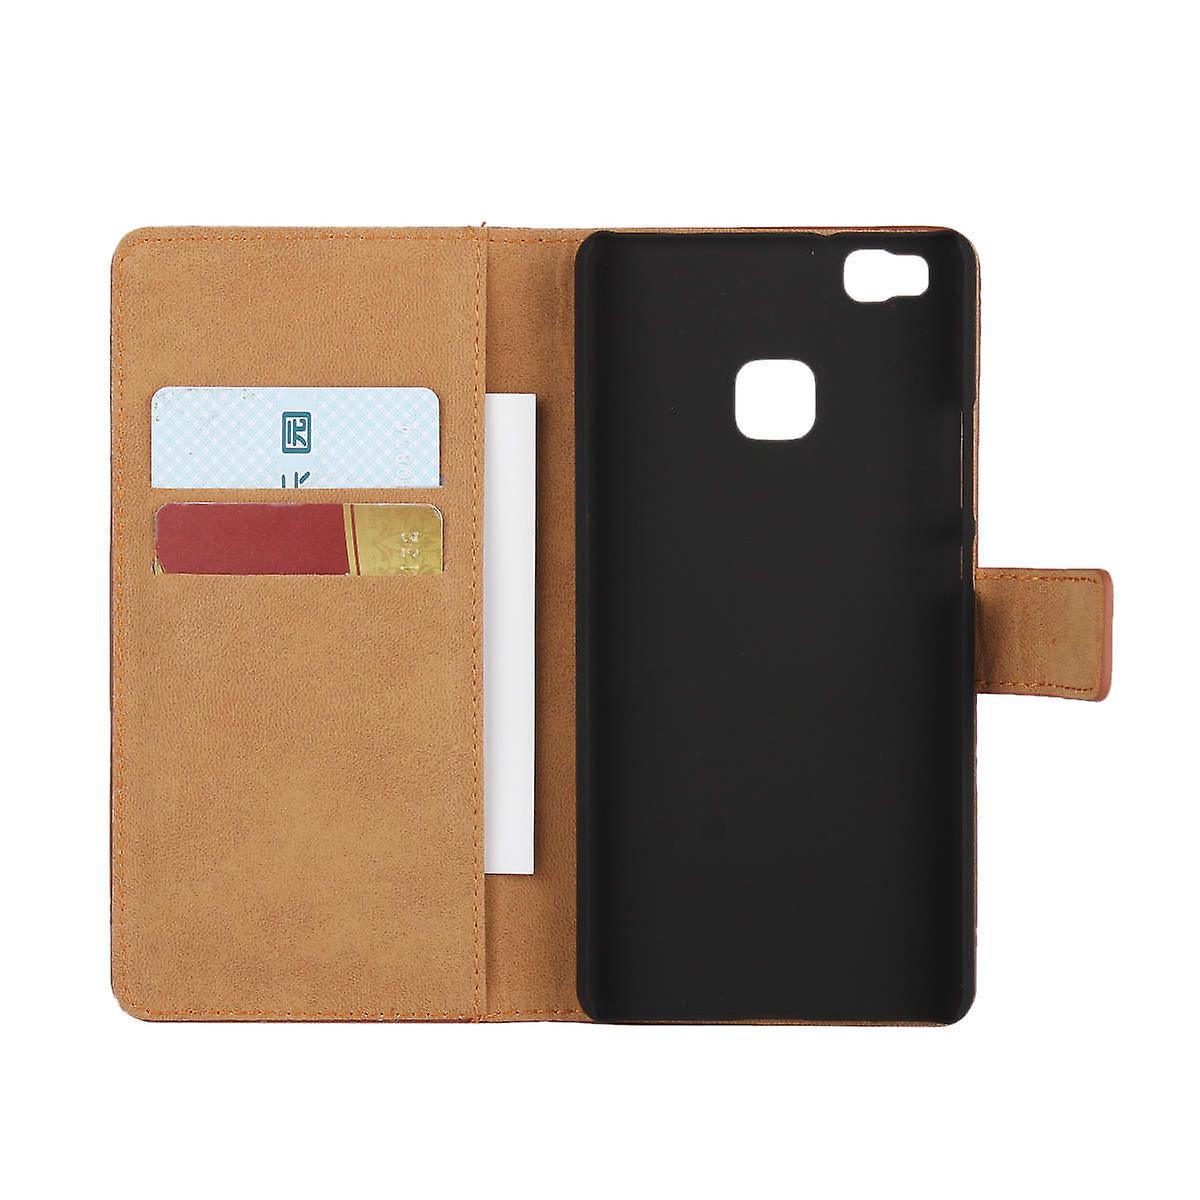 iCoverCase Huawei P9 Lite plånboksfodral